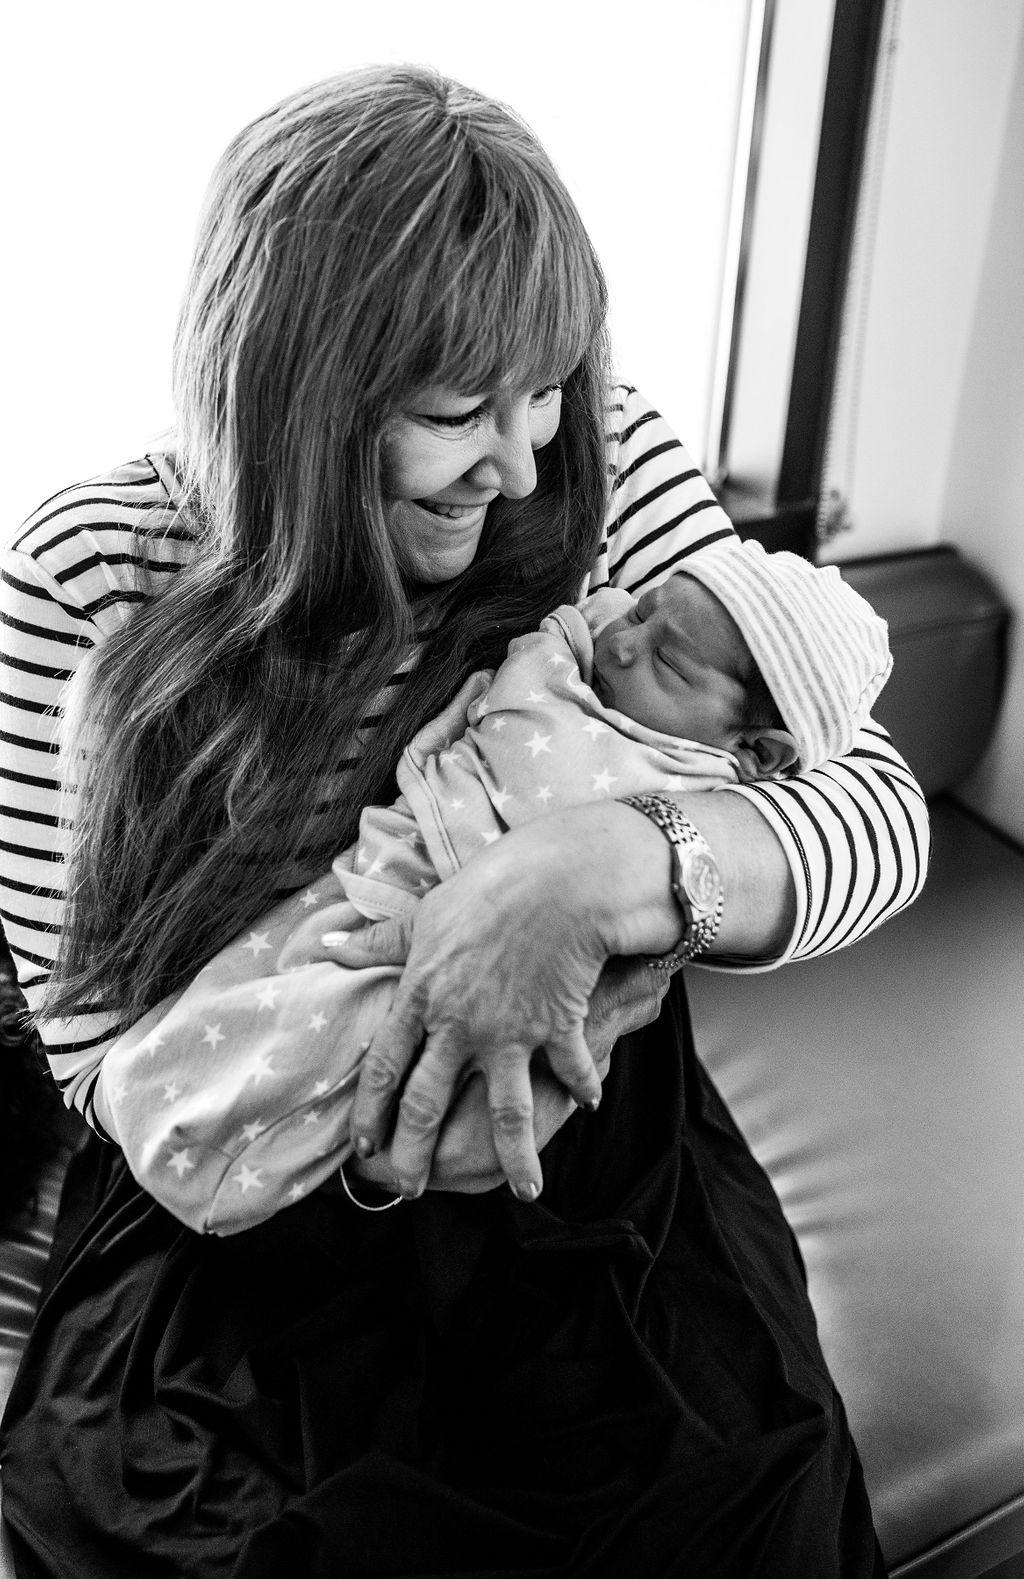 grandma with newborn-pensacola newborn photographer